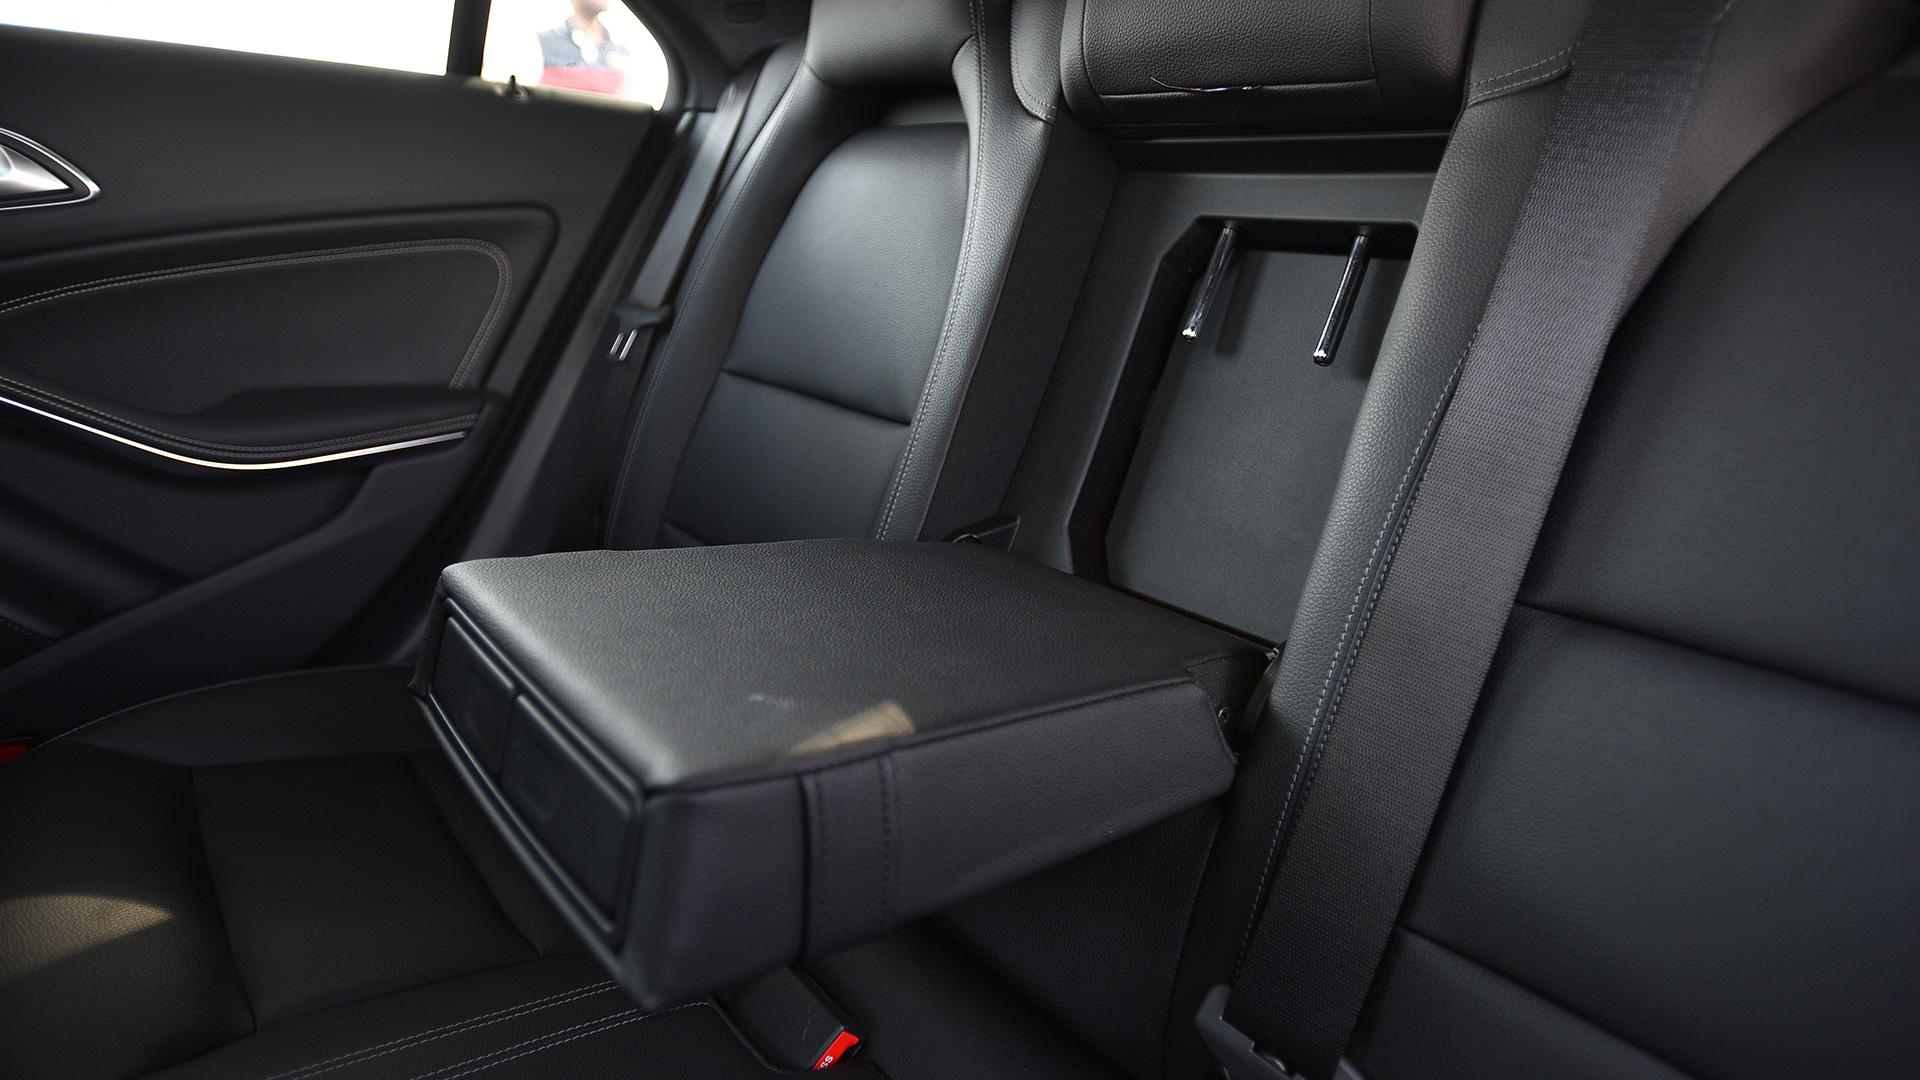 Mercedes Benz CLA 2017 200 Sport Interior